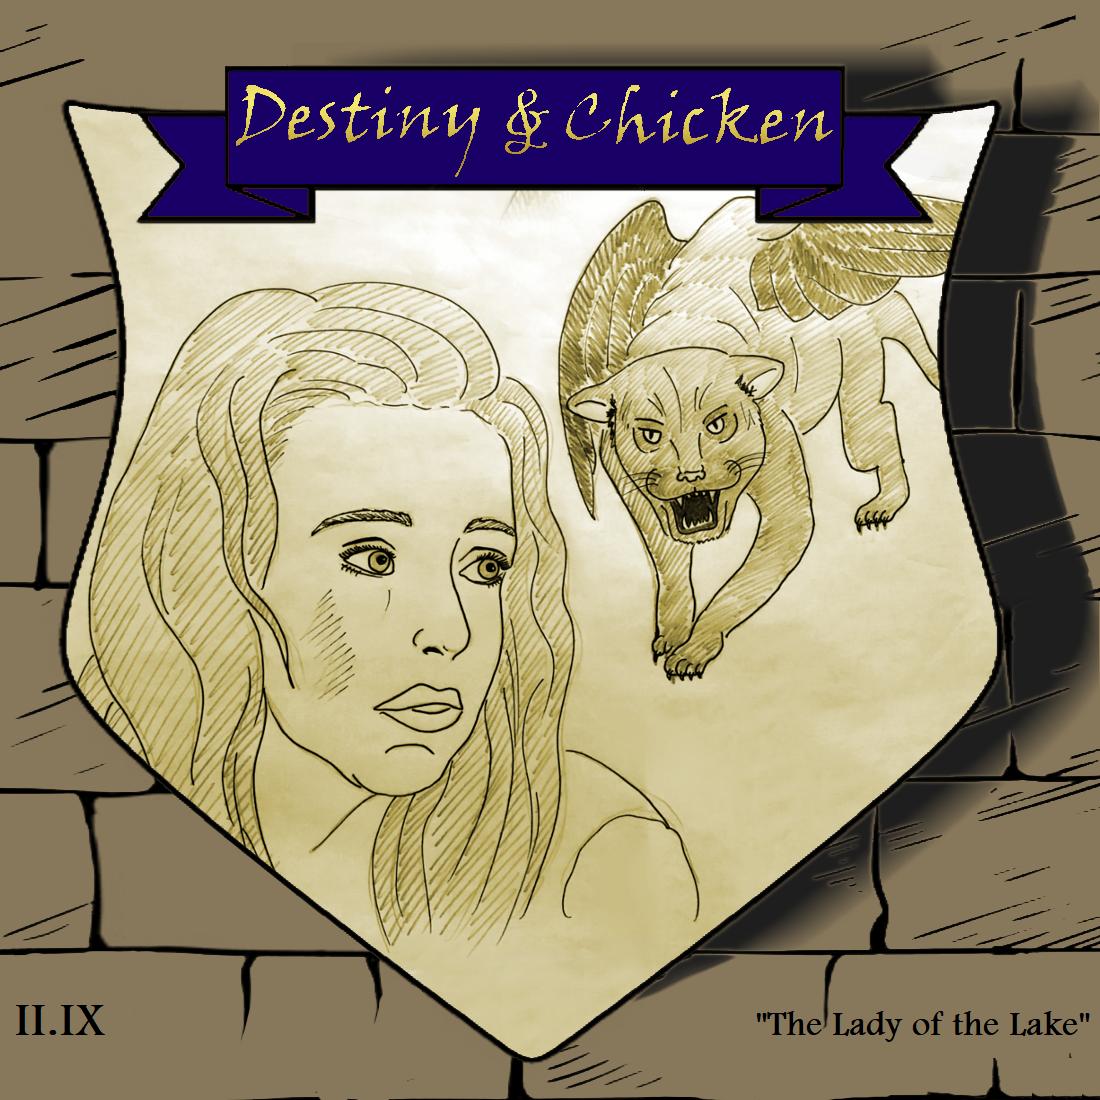 Episode II.IX - The Lady of the Lake